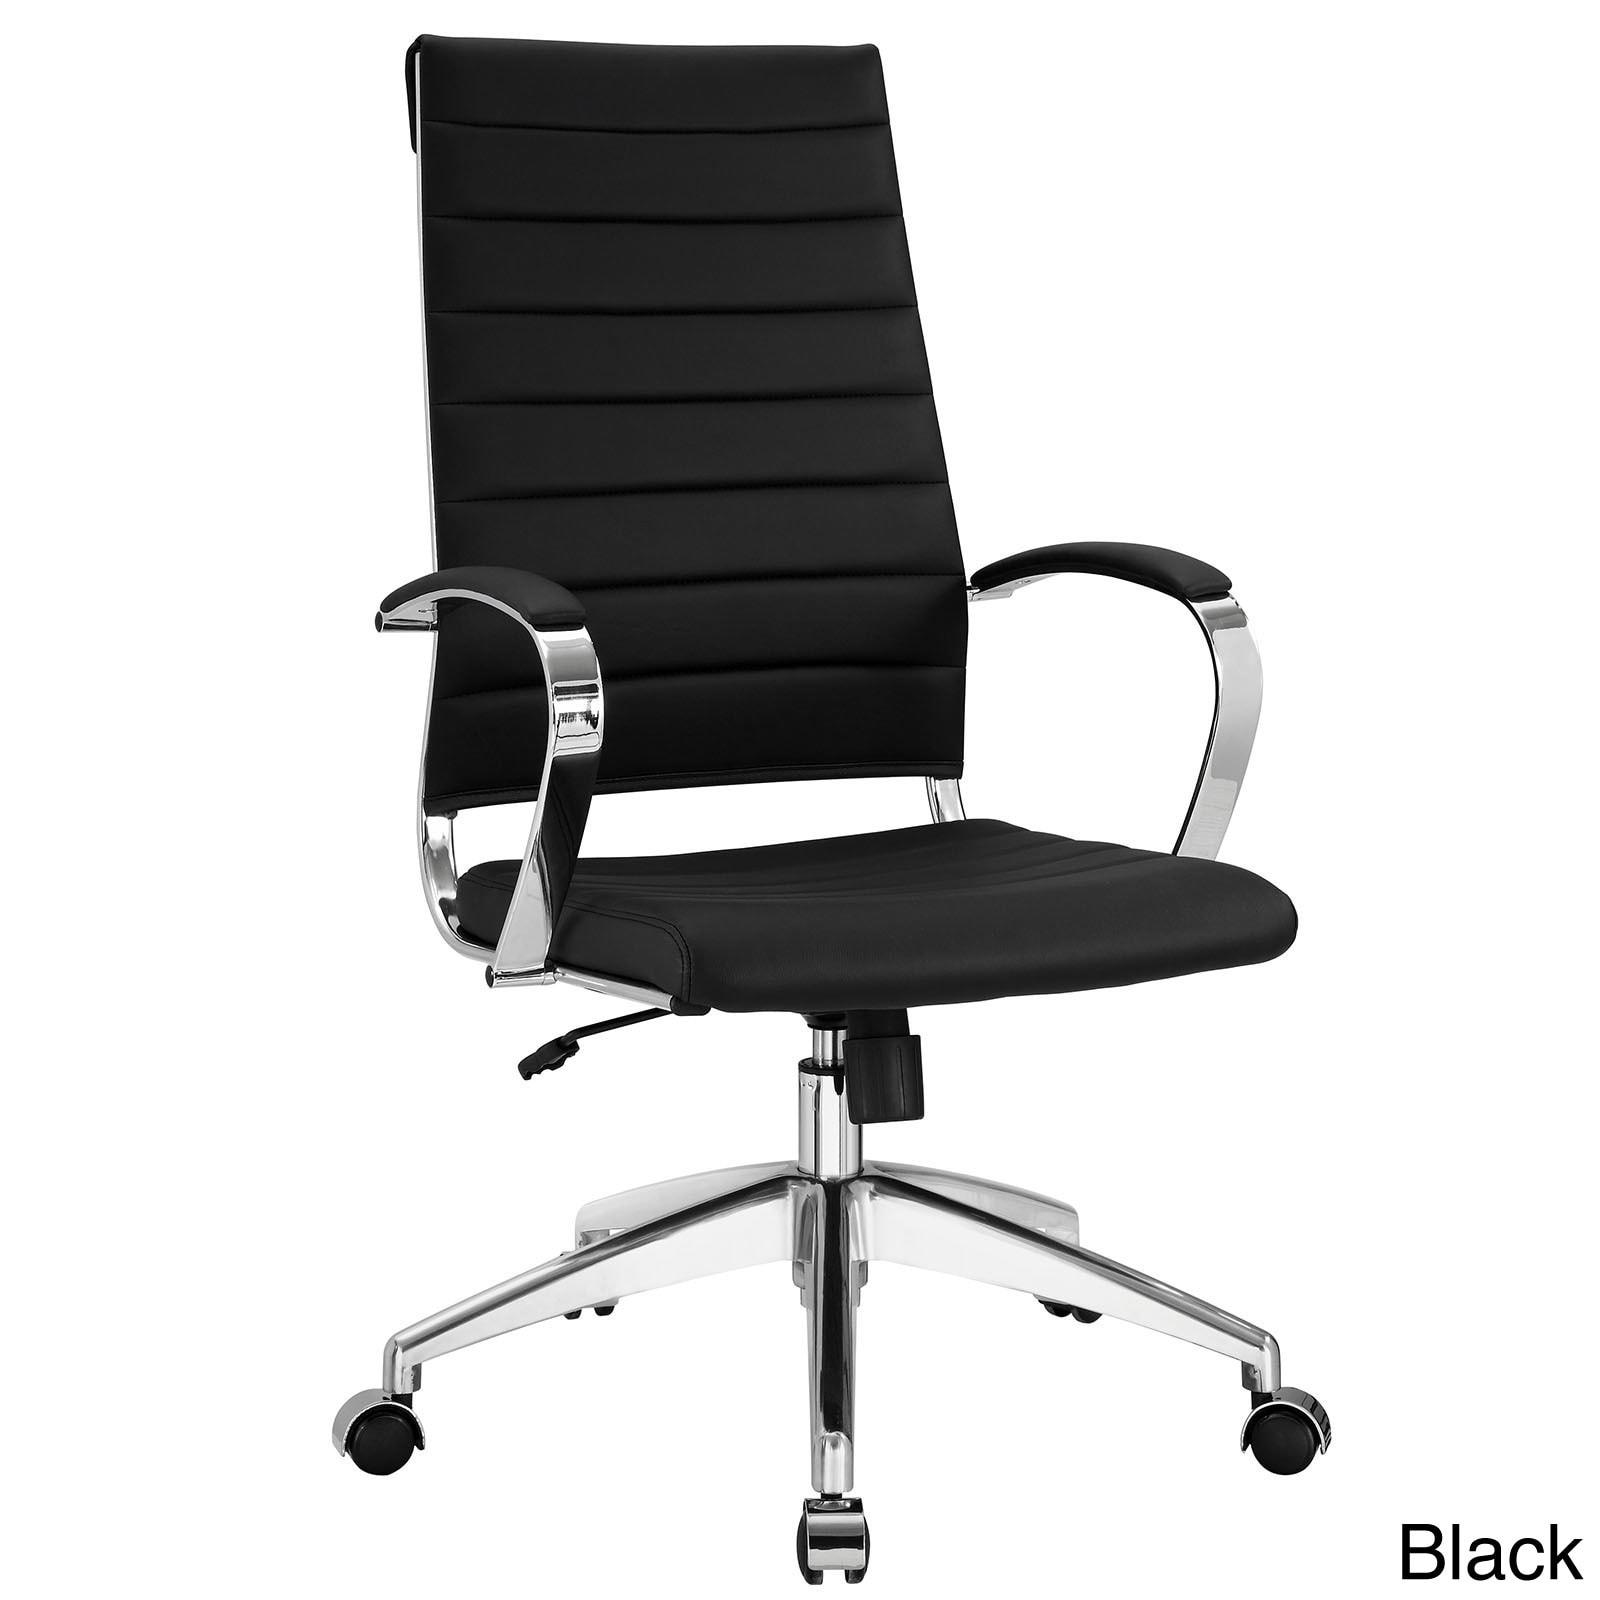 Modway Black Vinyl Jive Ribbed High Back Executive Office Chair